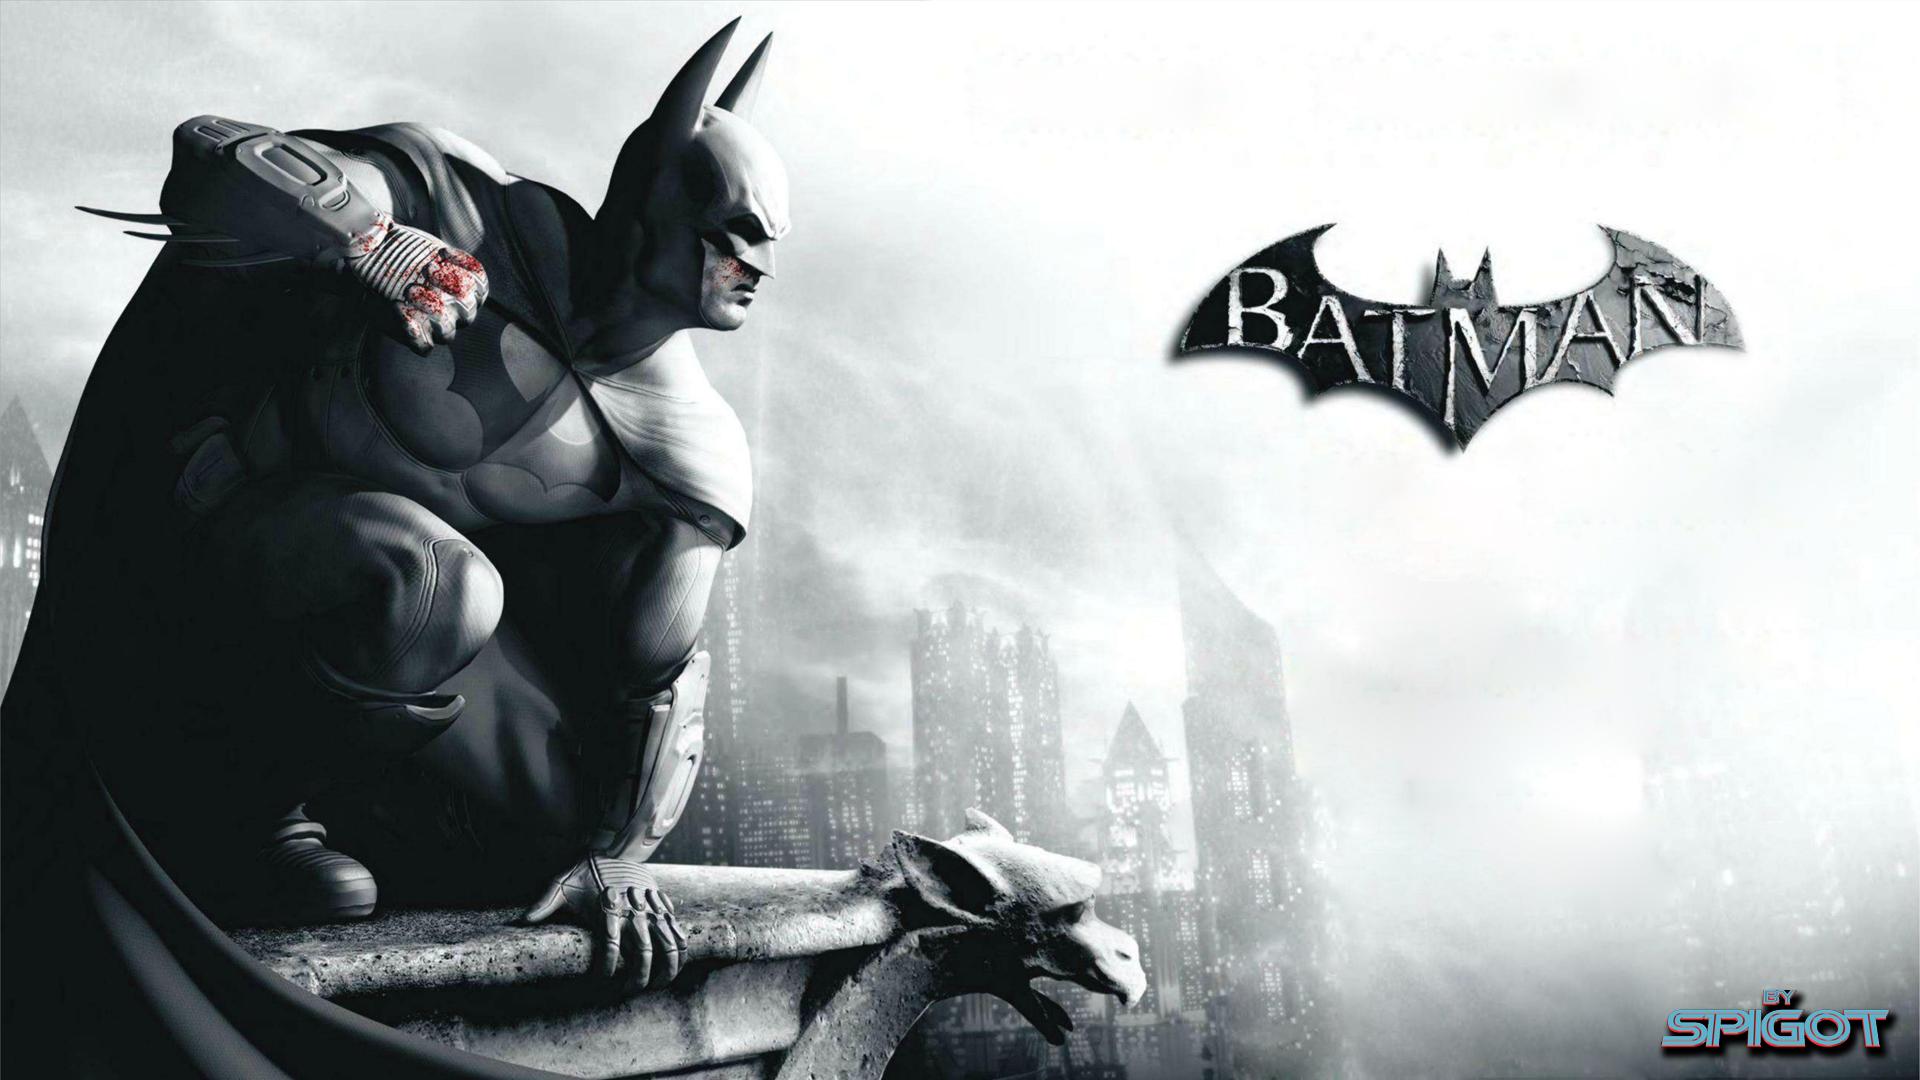 Batman Arkham City Xbox 360 wallpaper   631818 1920x1080